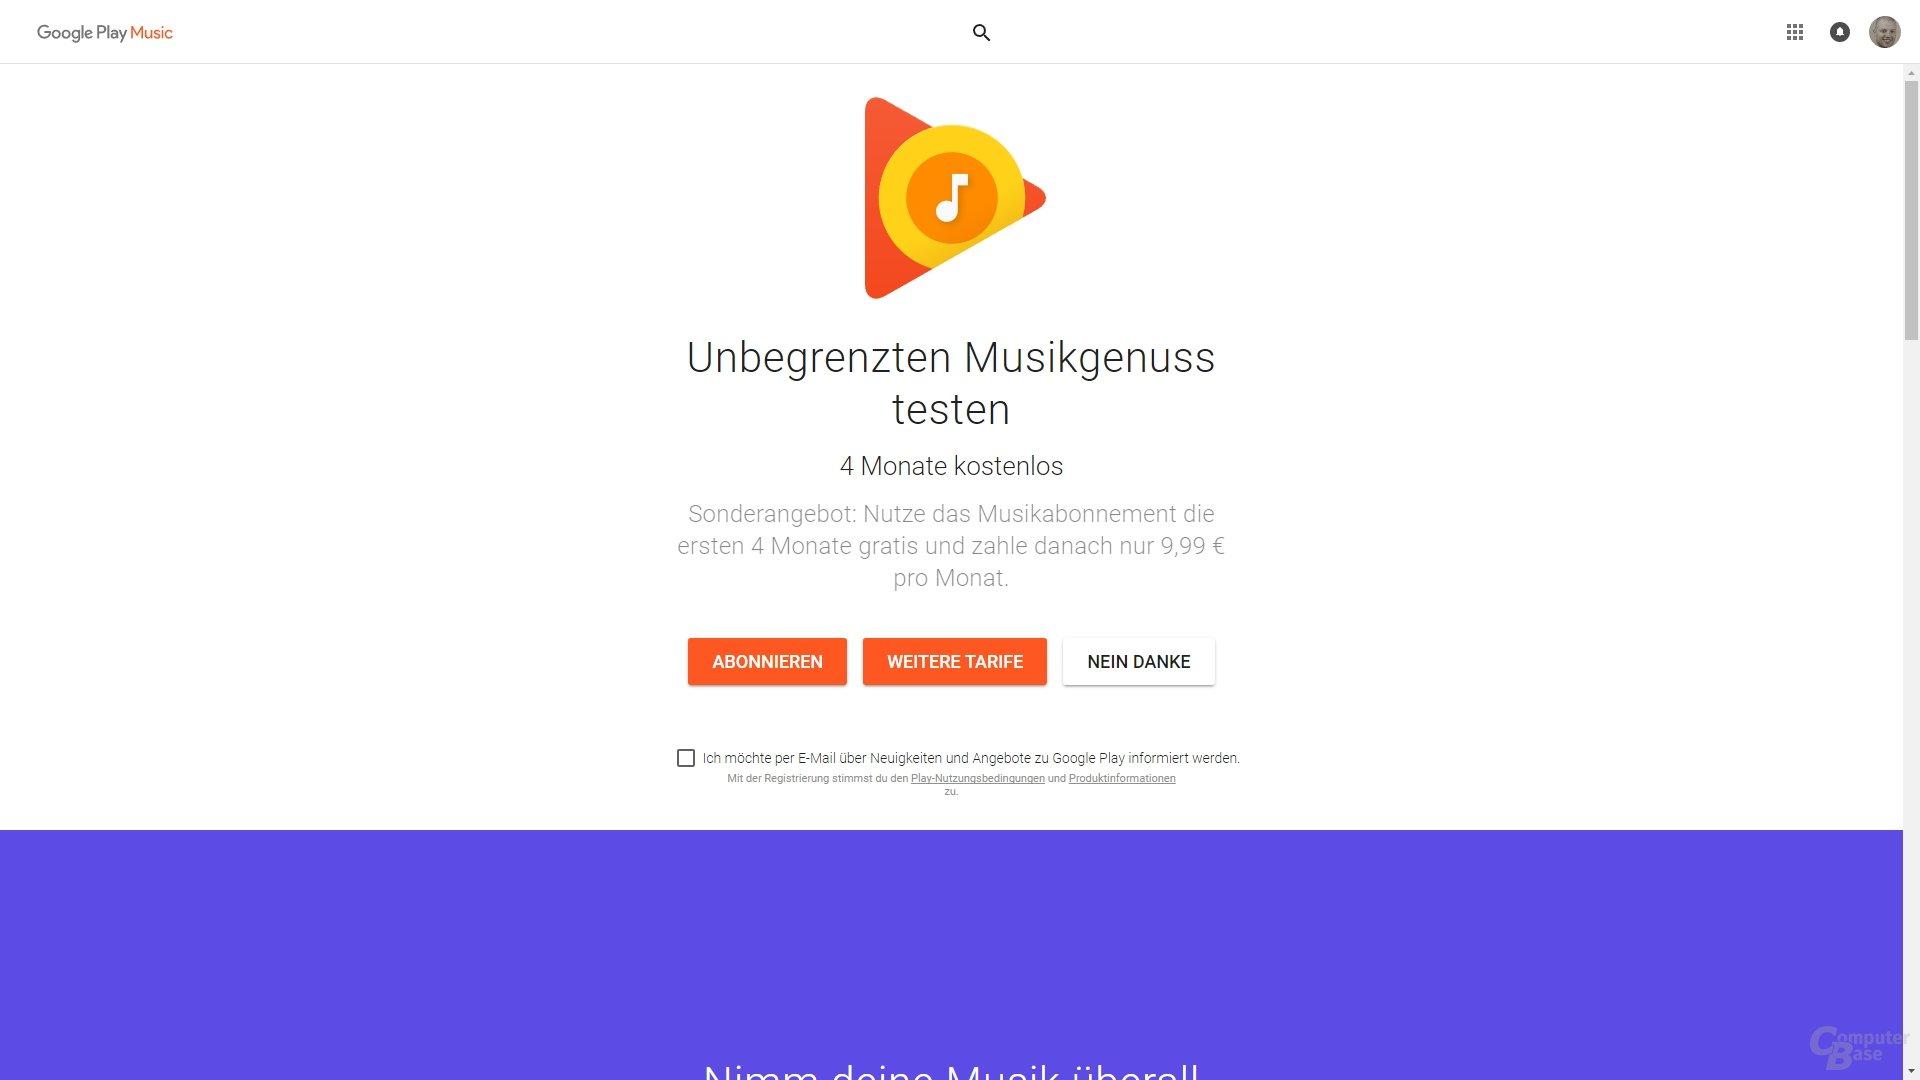 Google Play Music – 4 Monate statt 30 Tage kostenlos